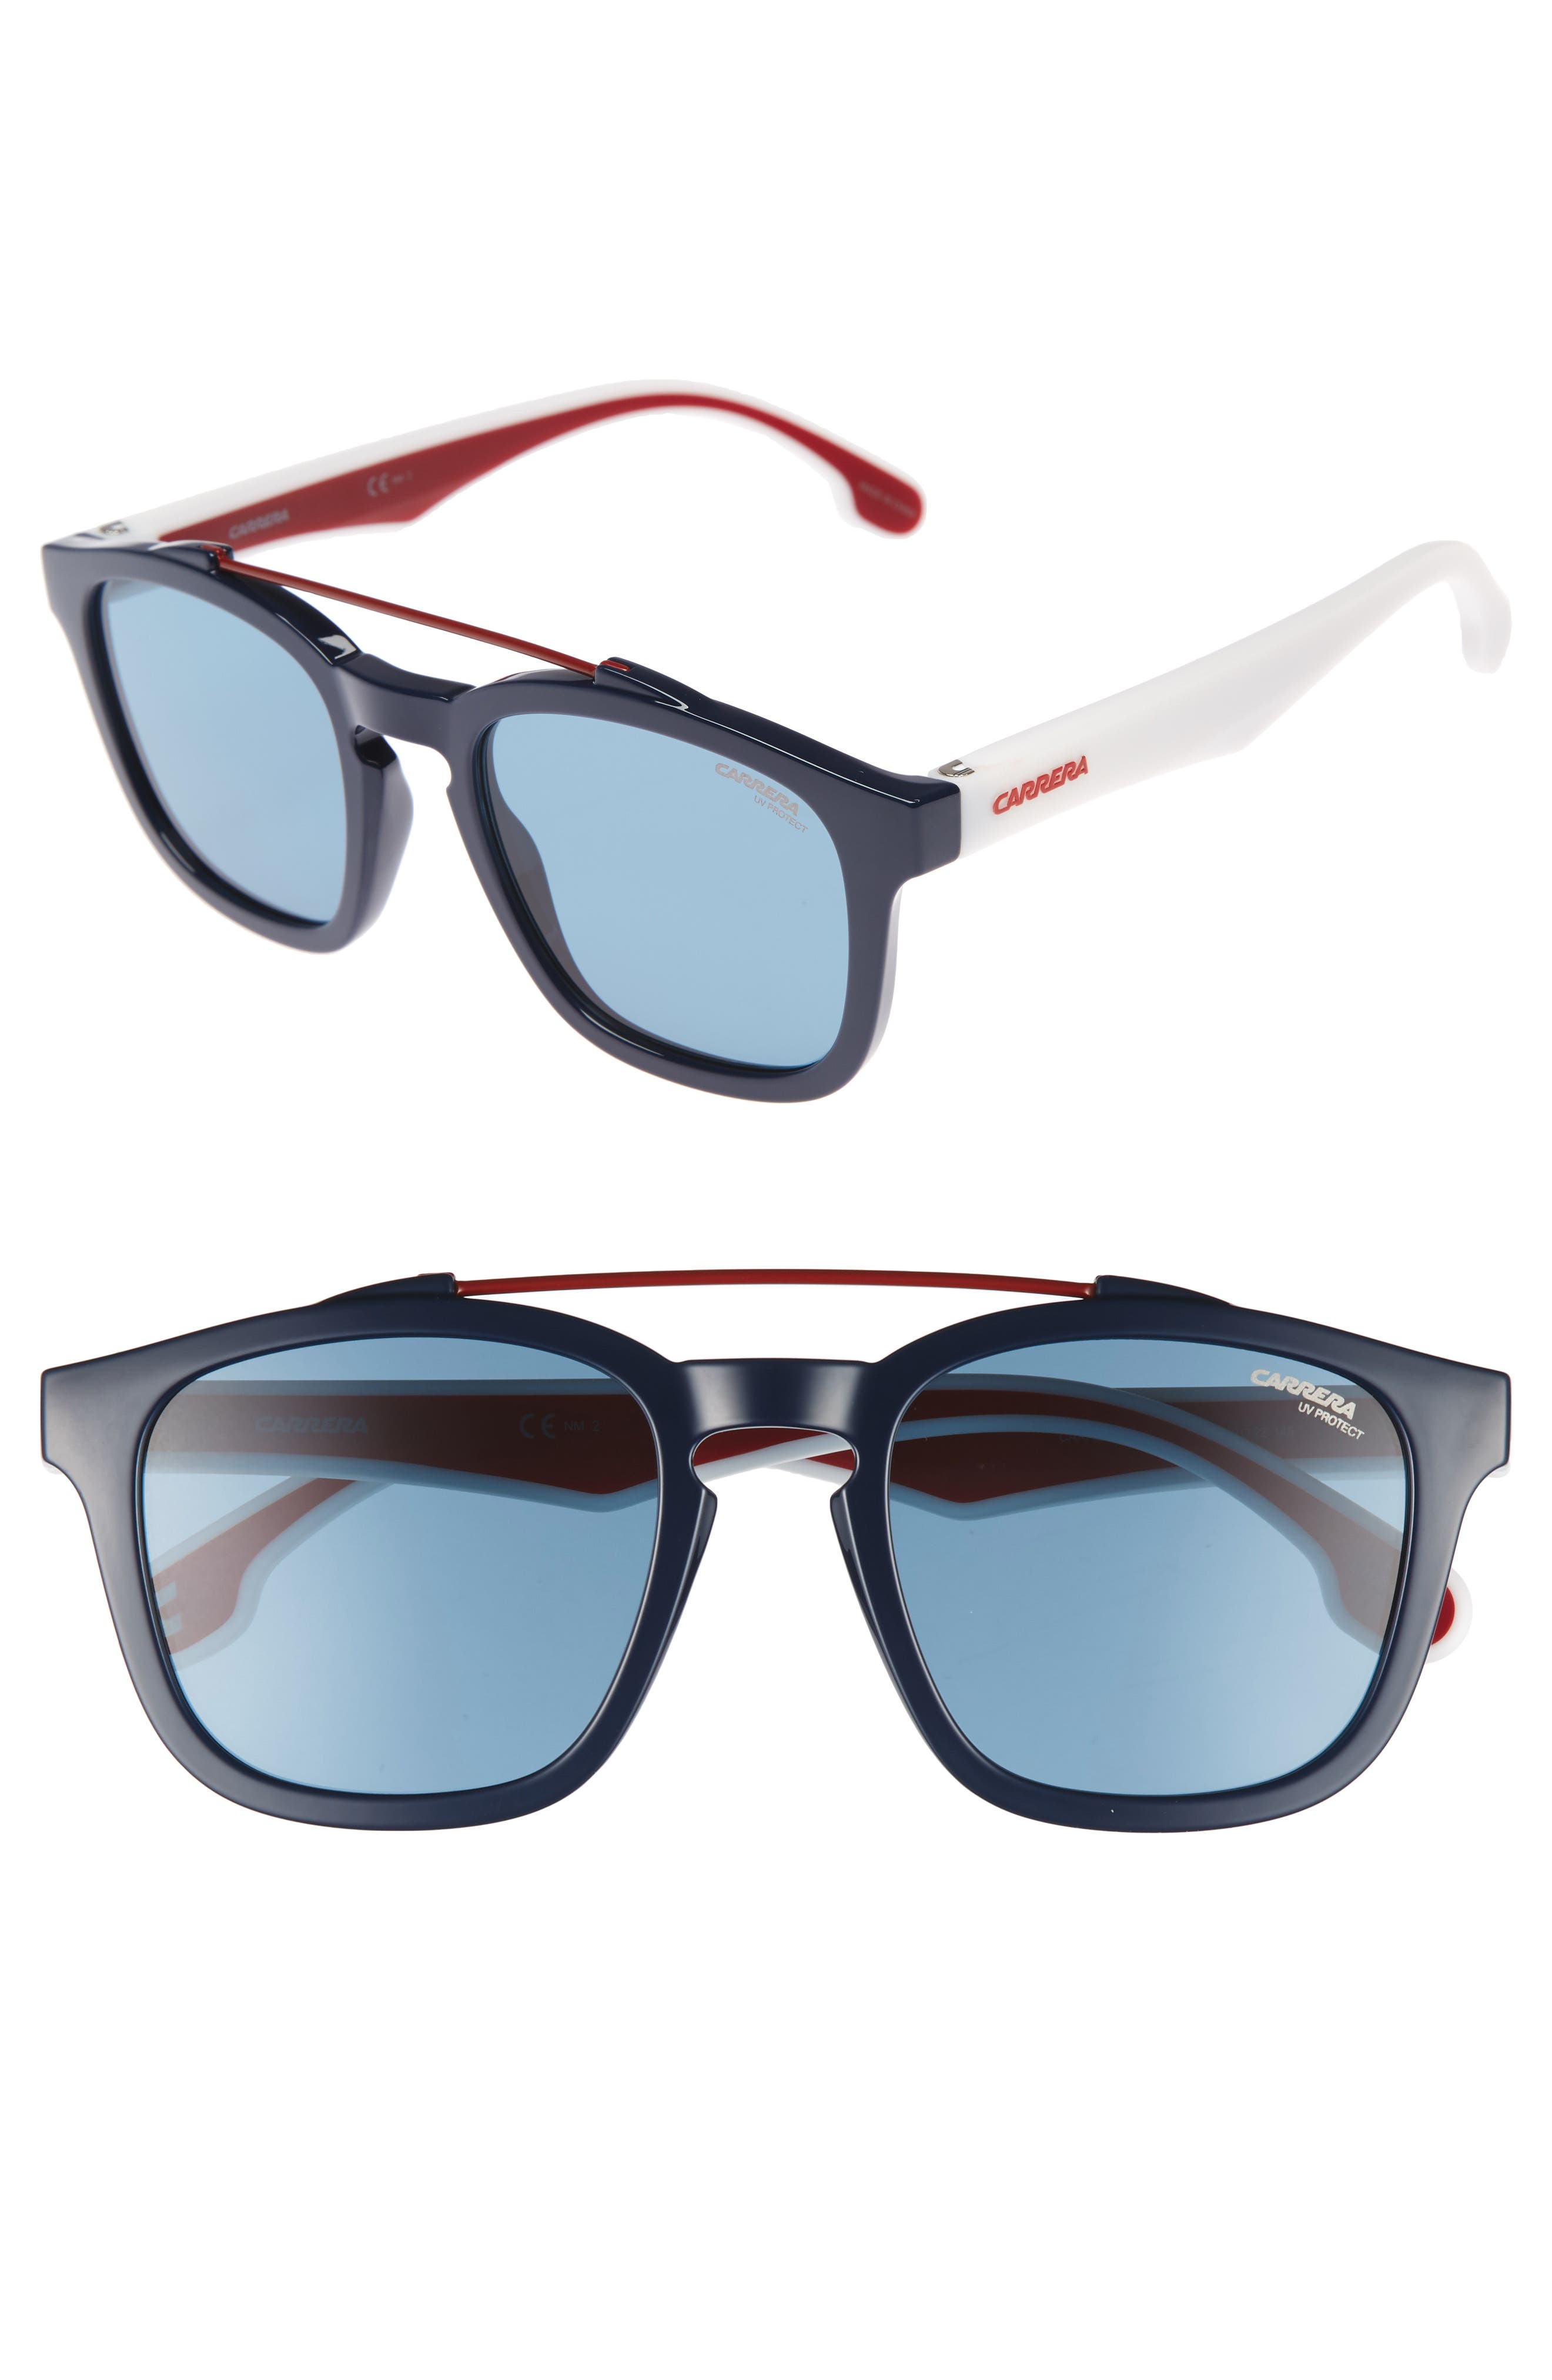 Carrera Eyewear 1011S Sunglasses